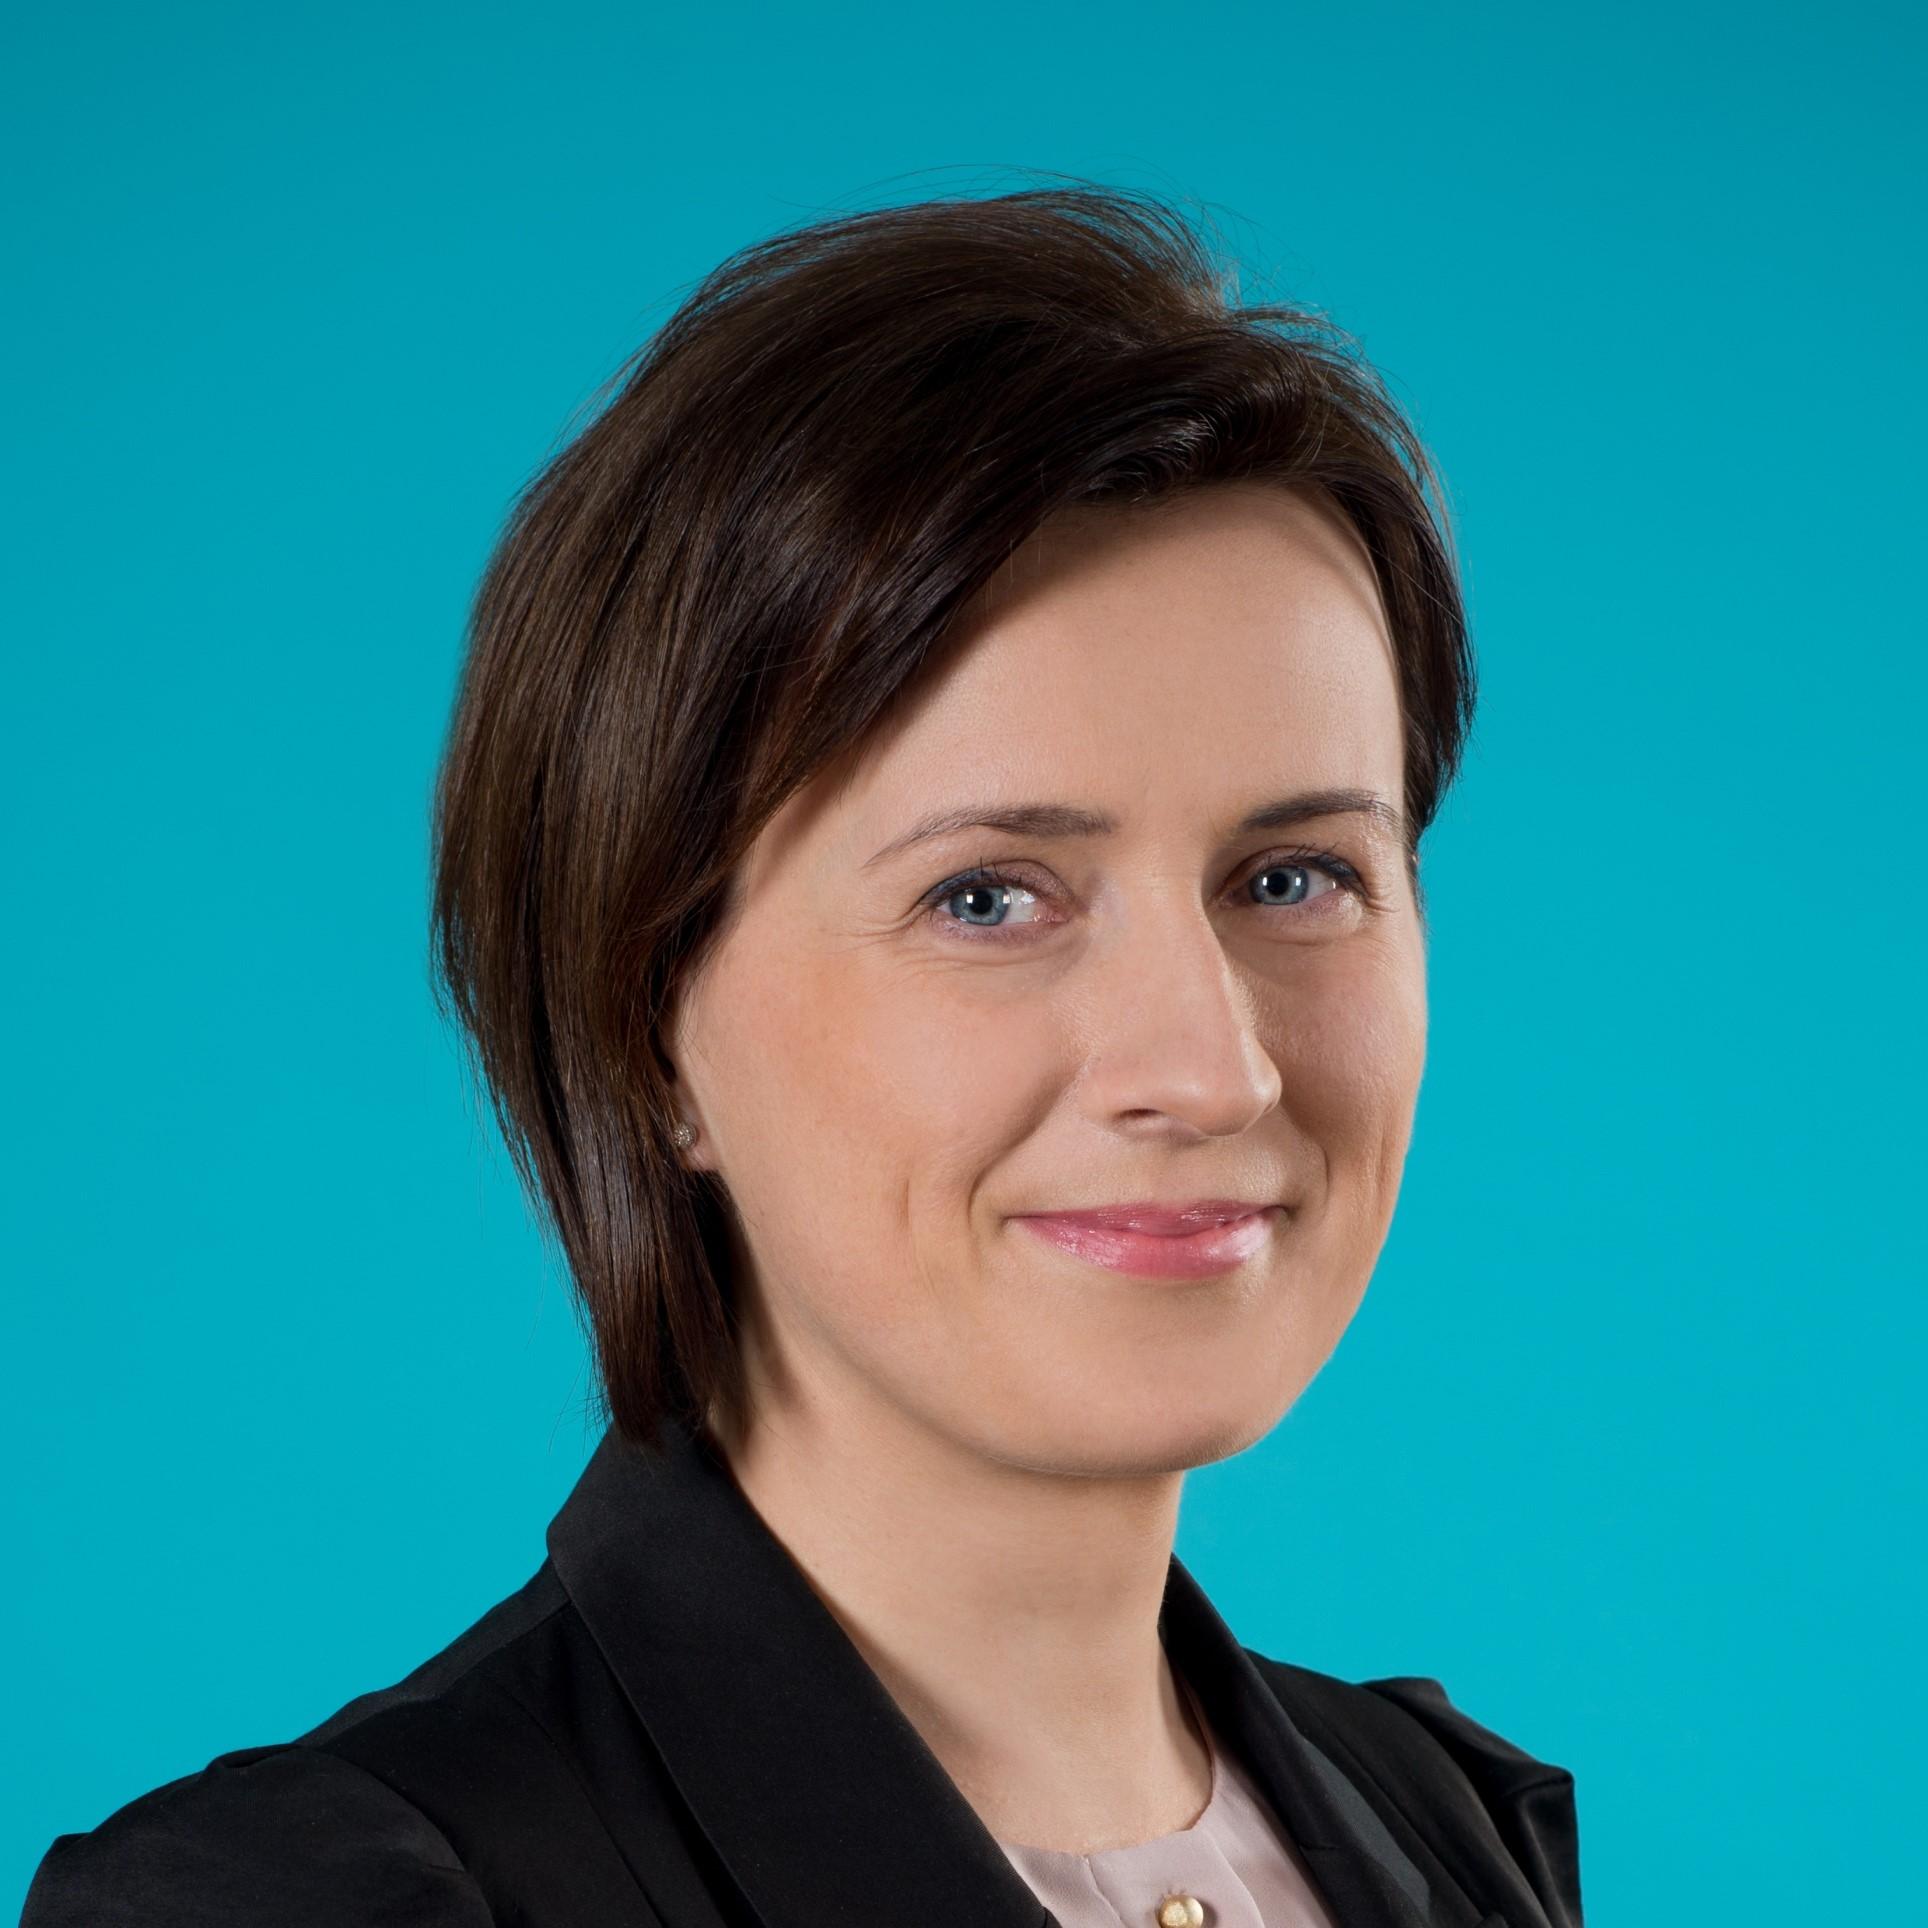 Daria Porębska